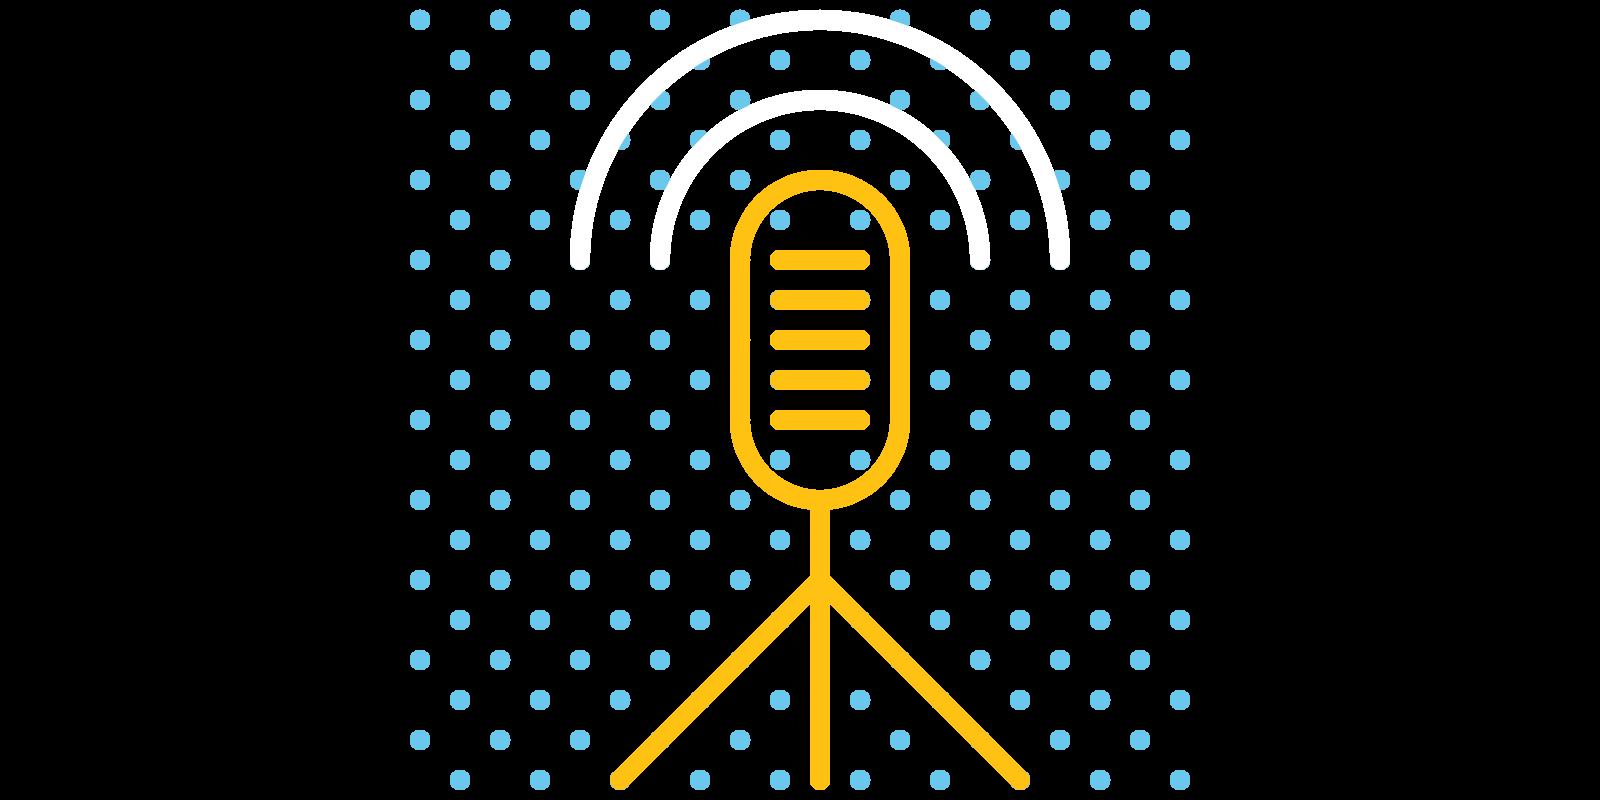 Microphone -